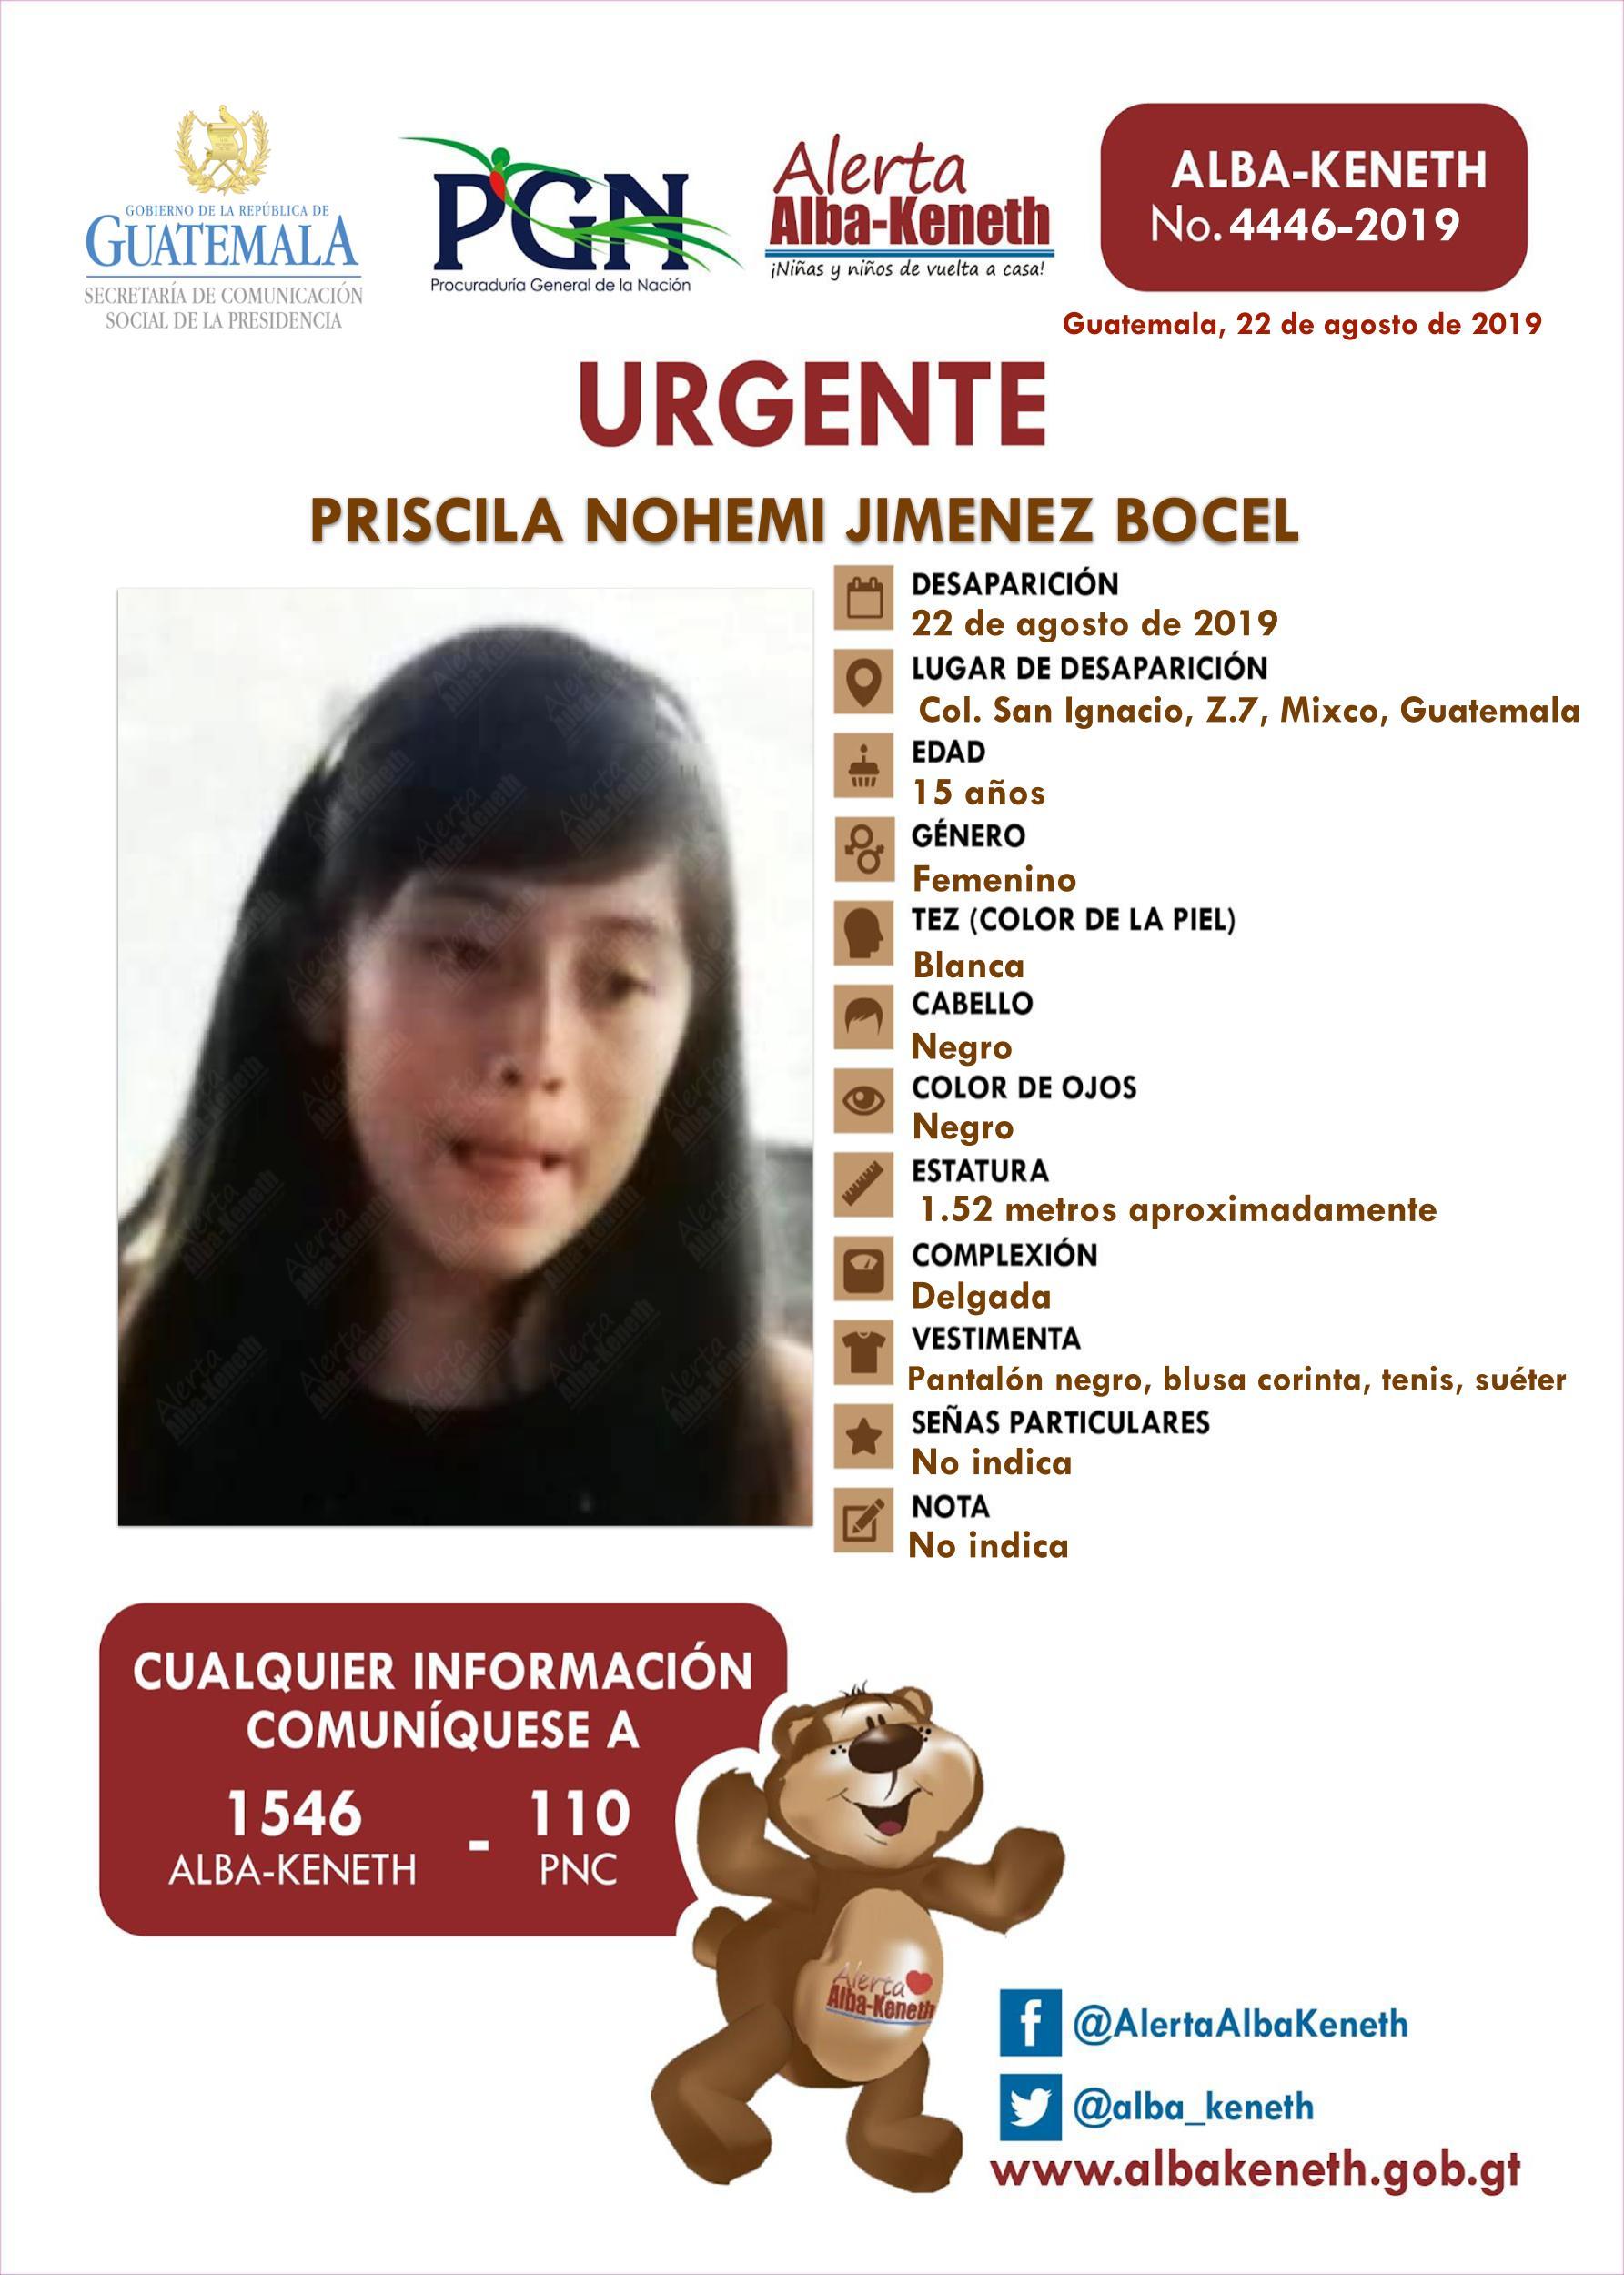 Priscila Nohemi Jimenez Bocel